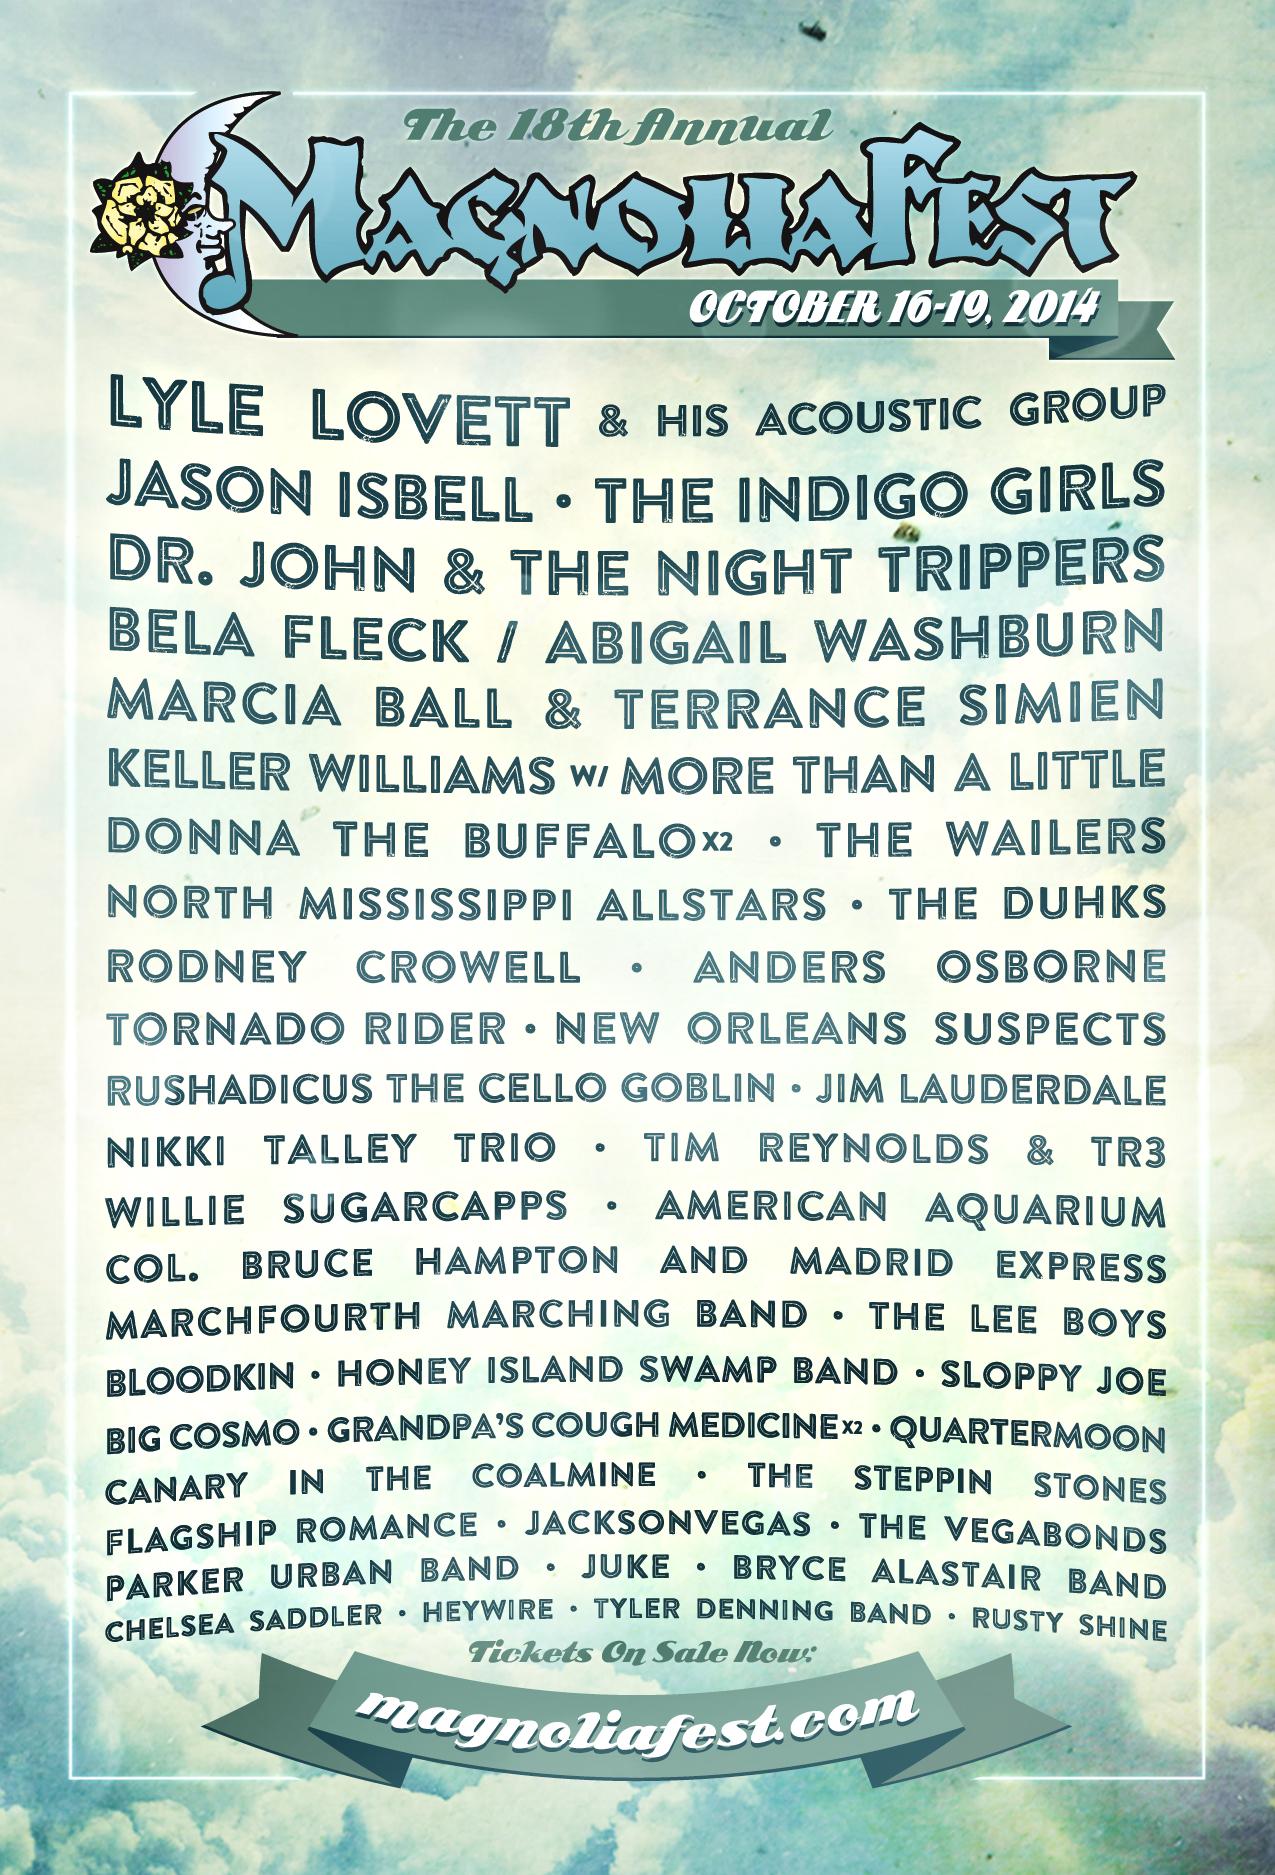 Magnolia Fest 2014 Oct. 16-19, Live Oak, FL